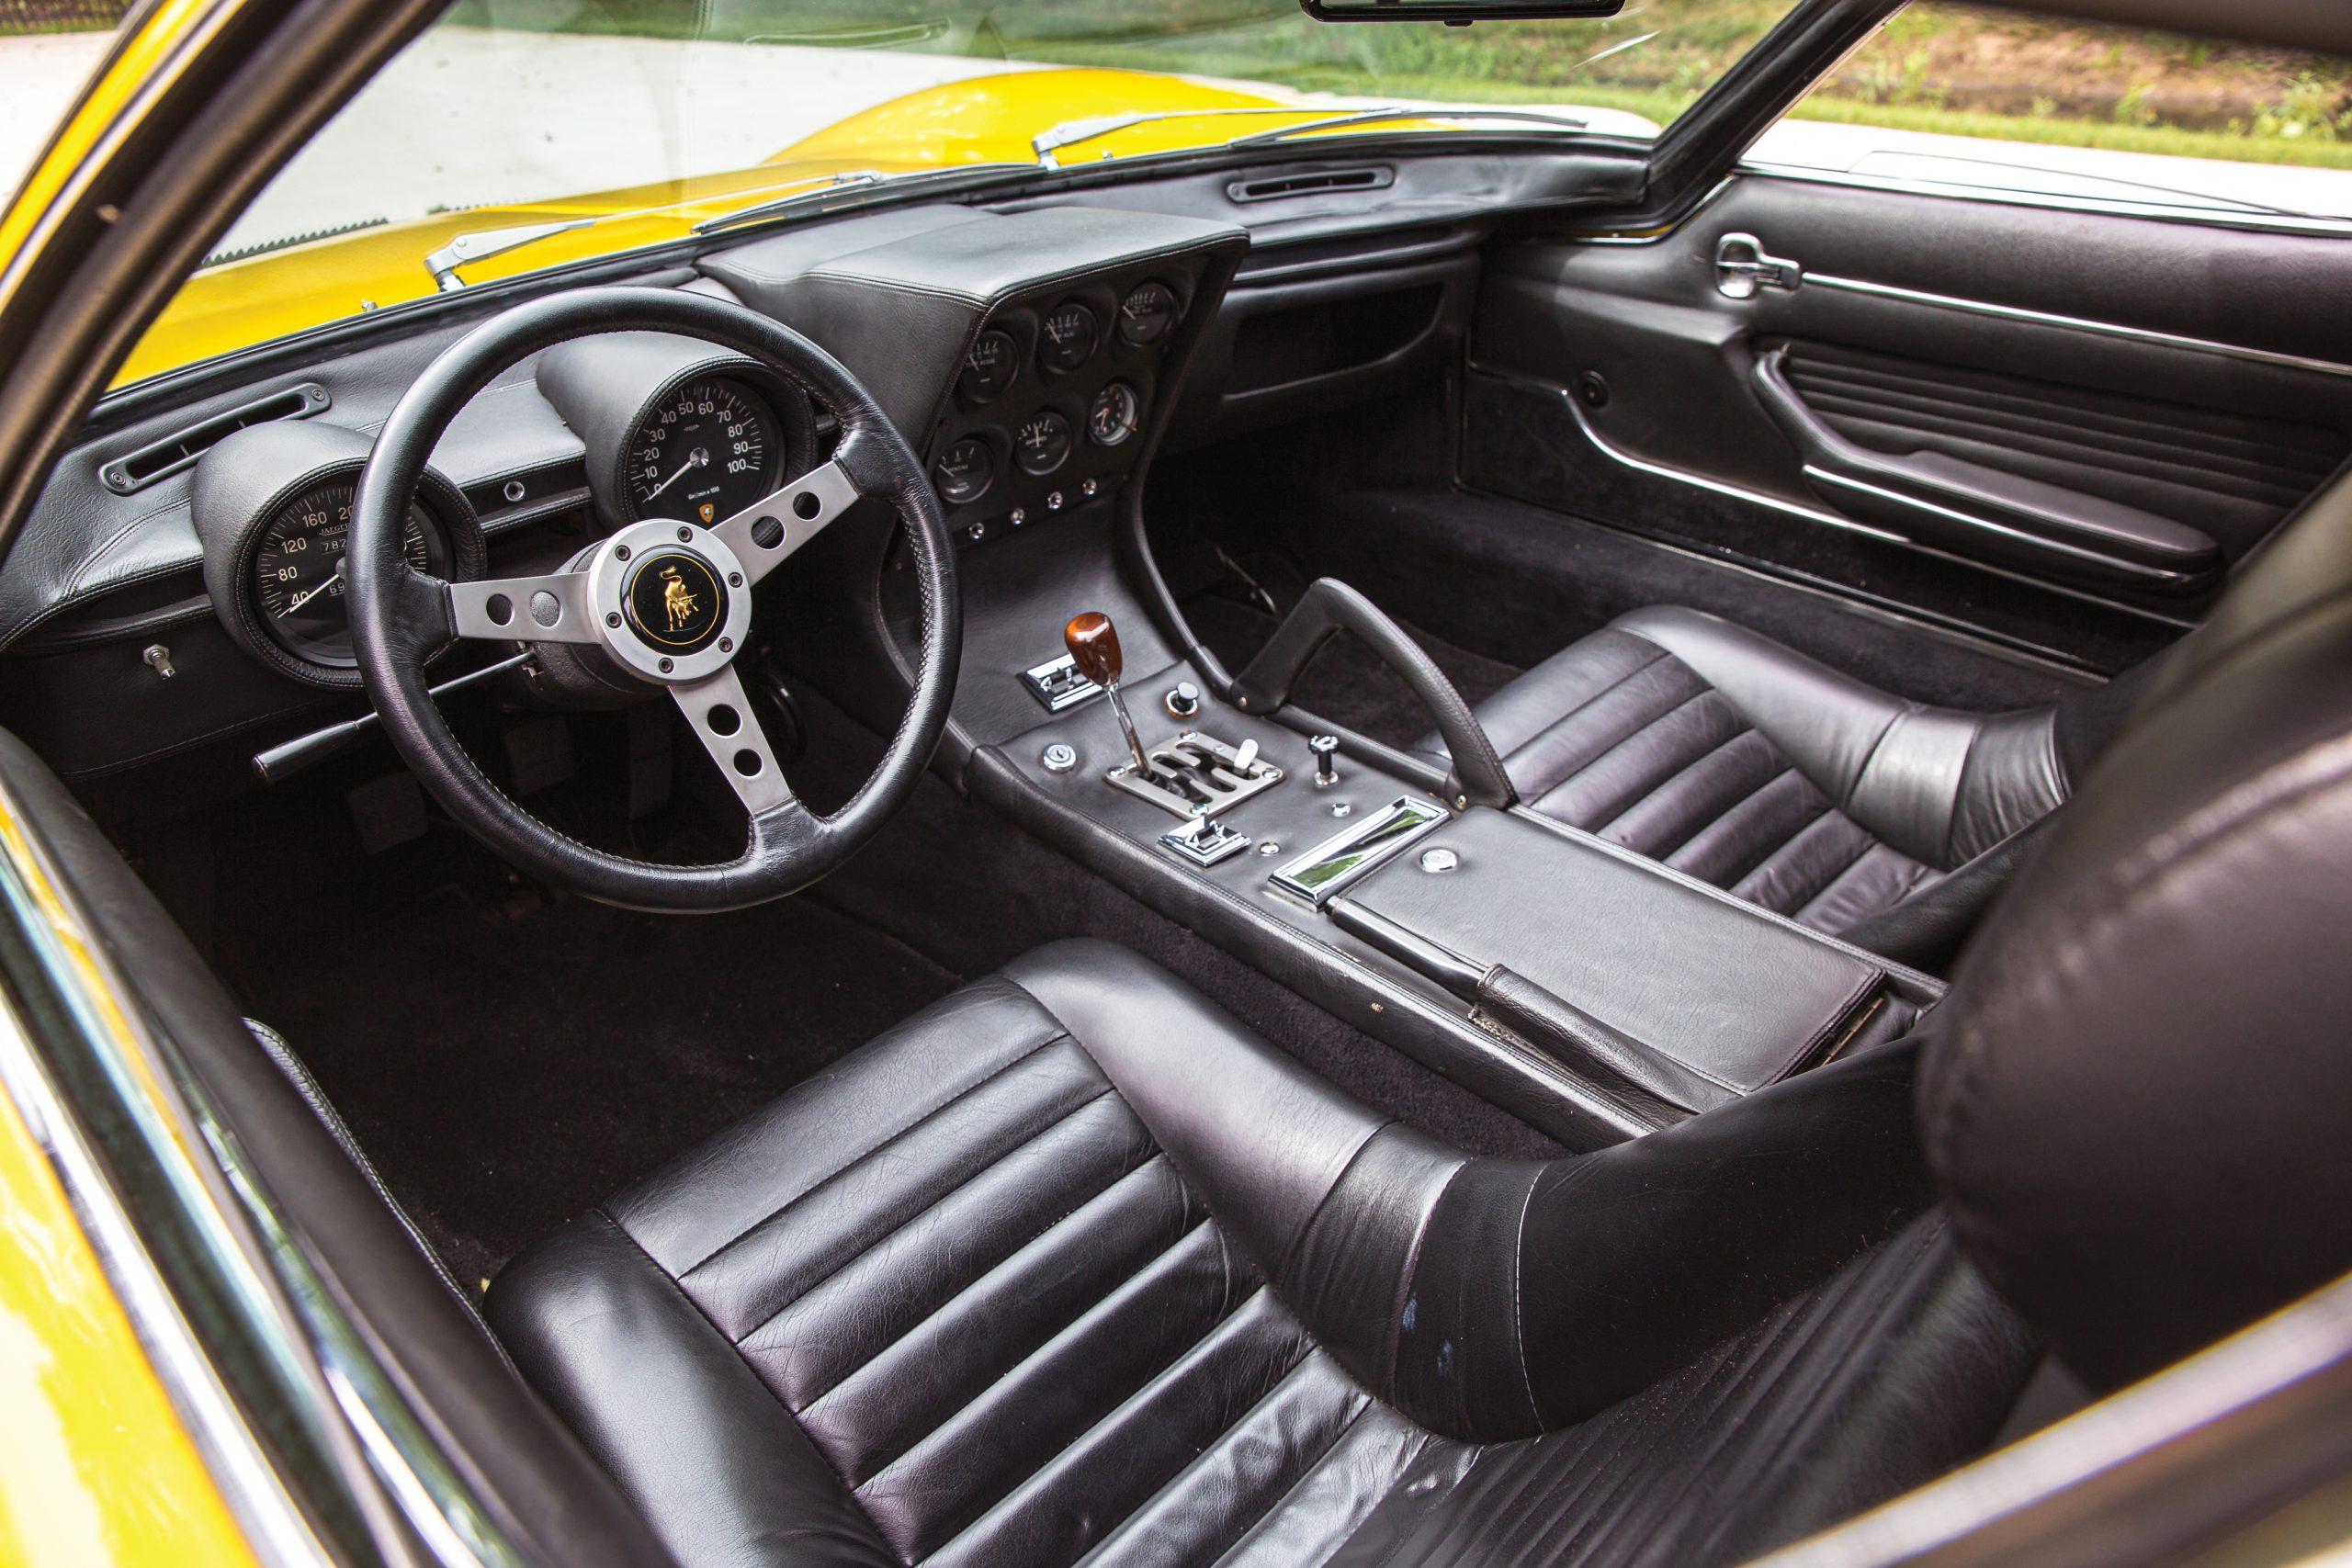 1969 Lamborghini Miura P400 S by Bertone interior